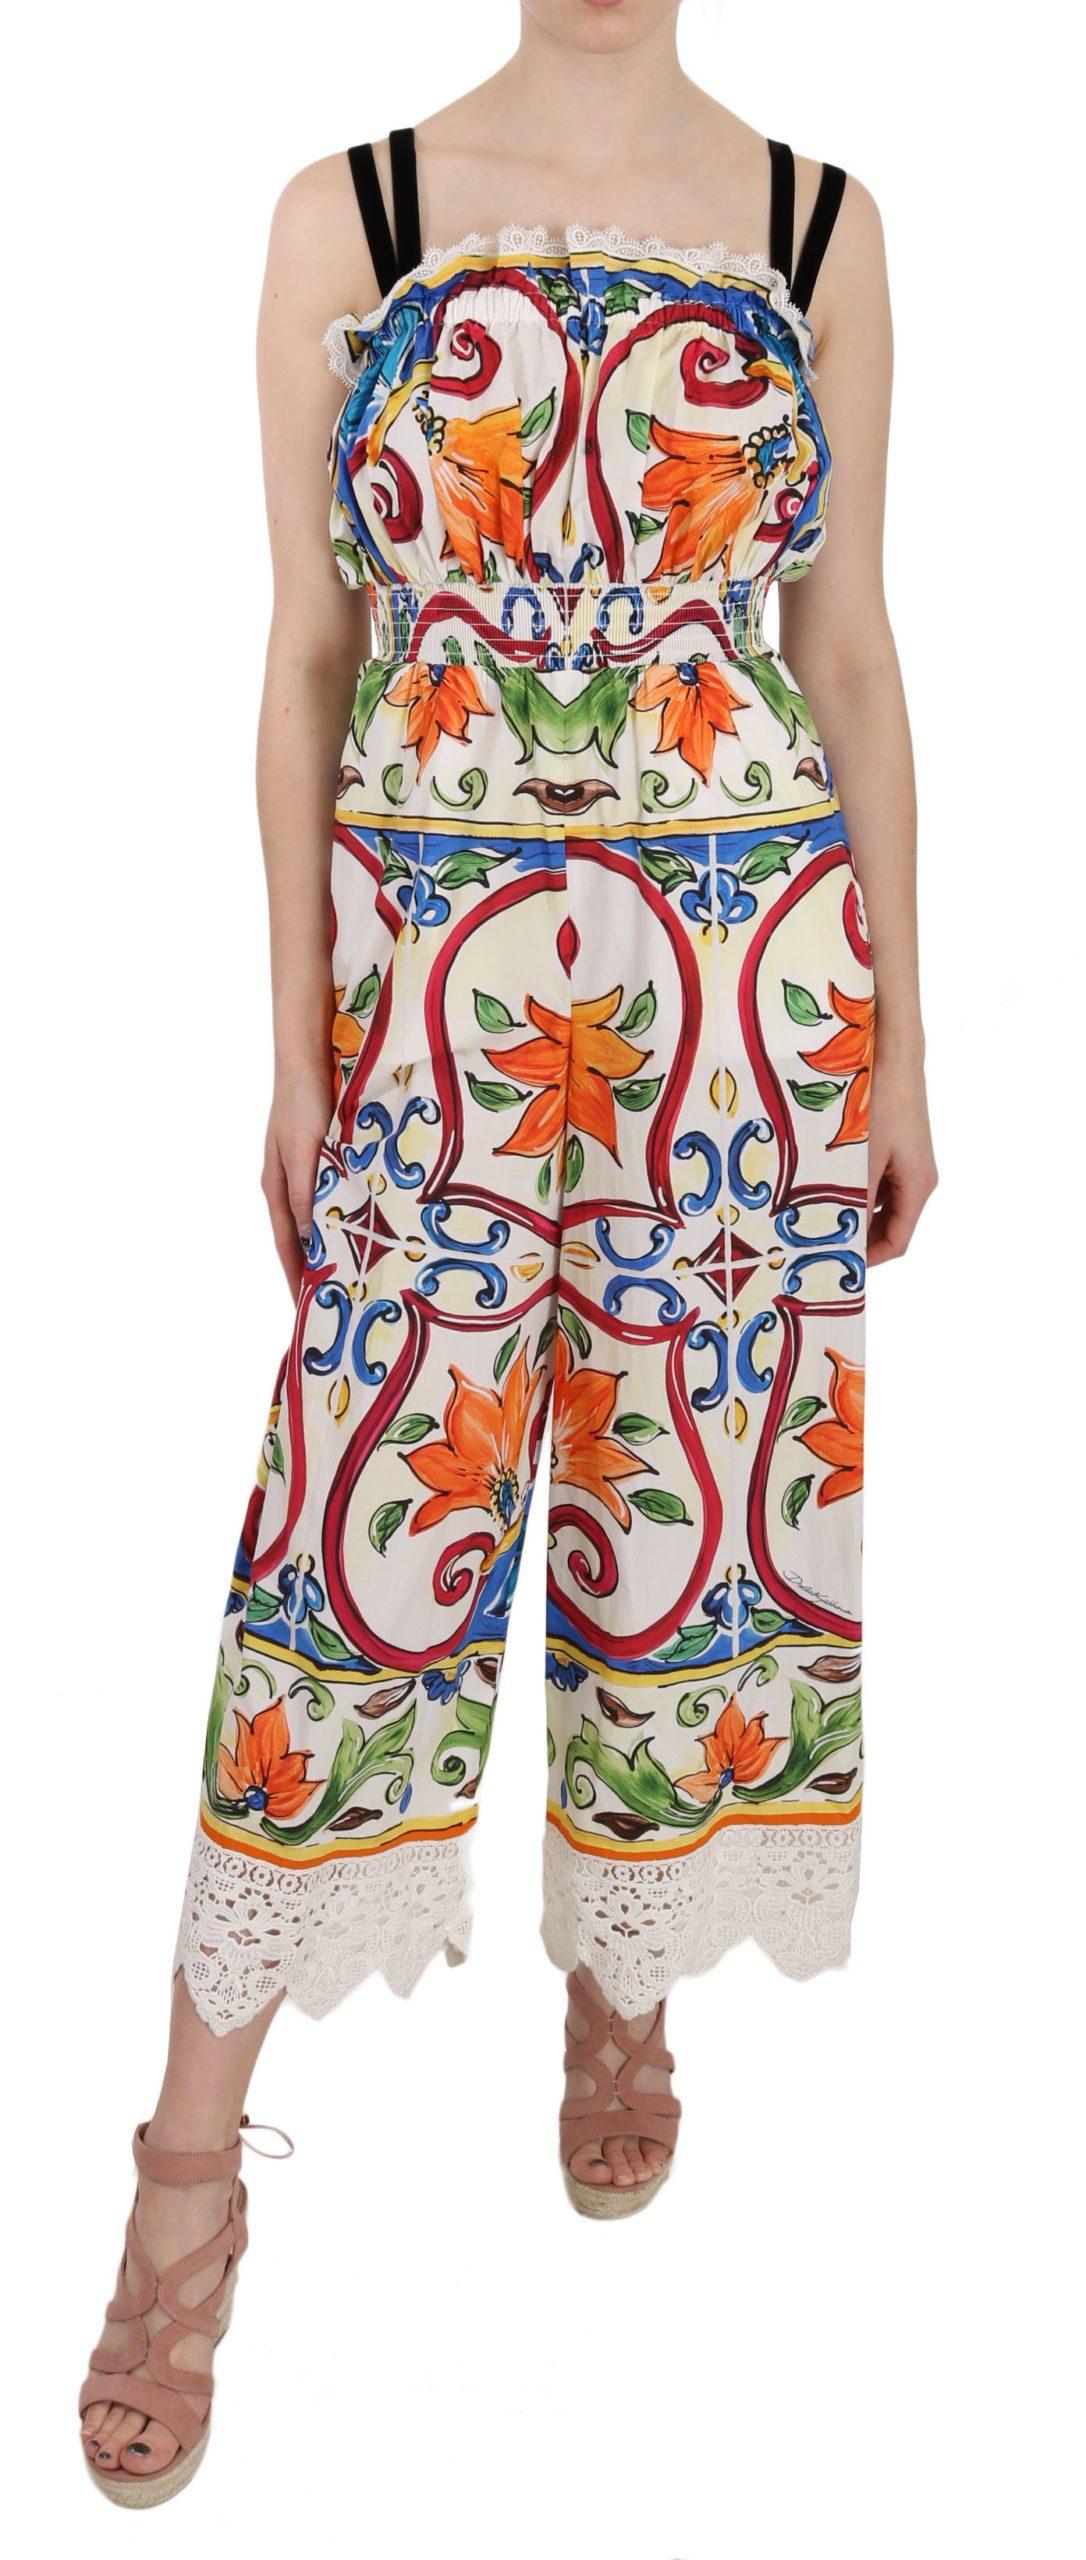 Dolce & Gabbana Women's Majolica Cotton Dress Multicolor DR1674 - IT38 XS